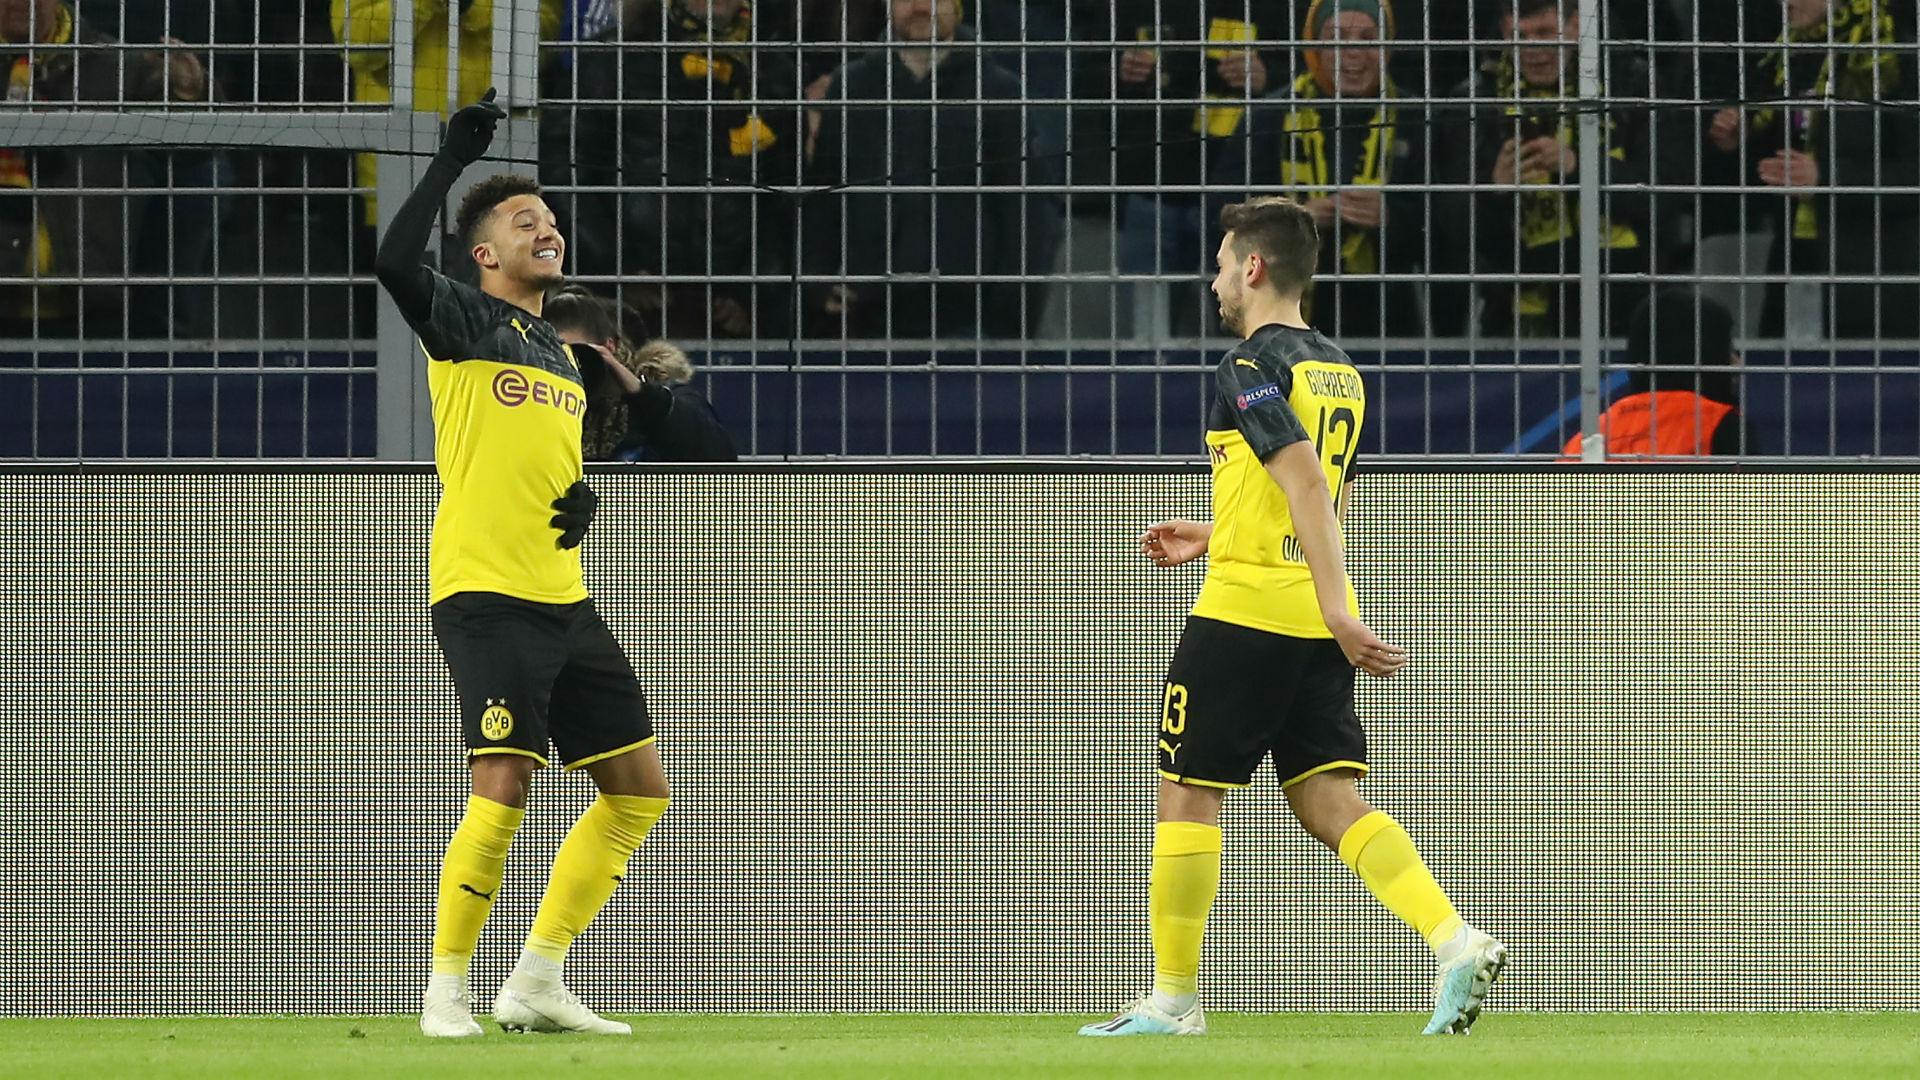 Borussia Dortmund 2-1 Slavia Prague: Sancho and Brandt seal last-16 spot